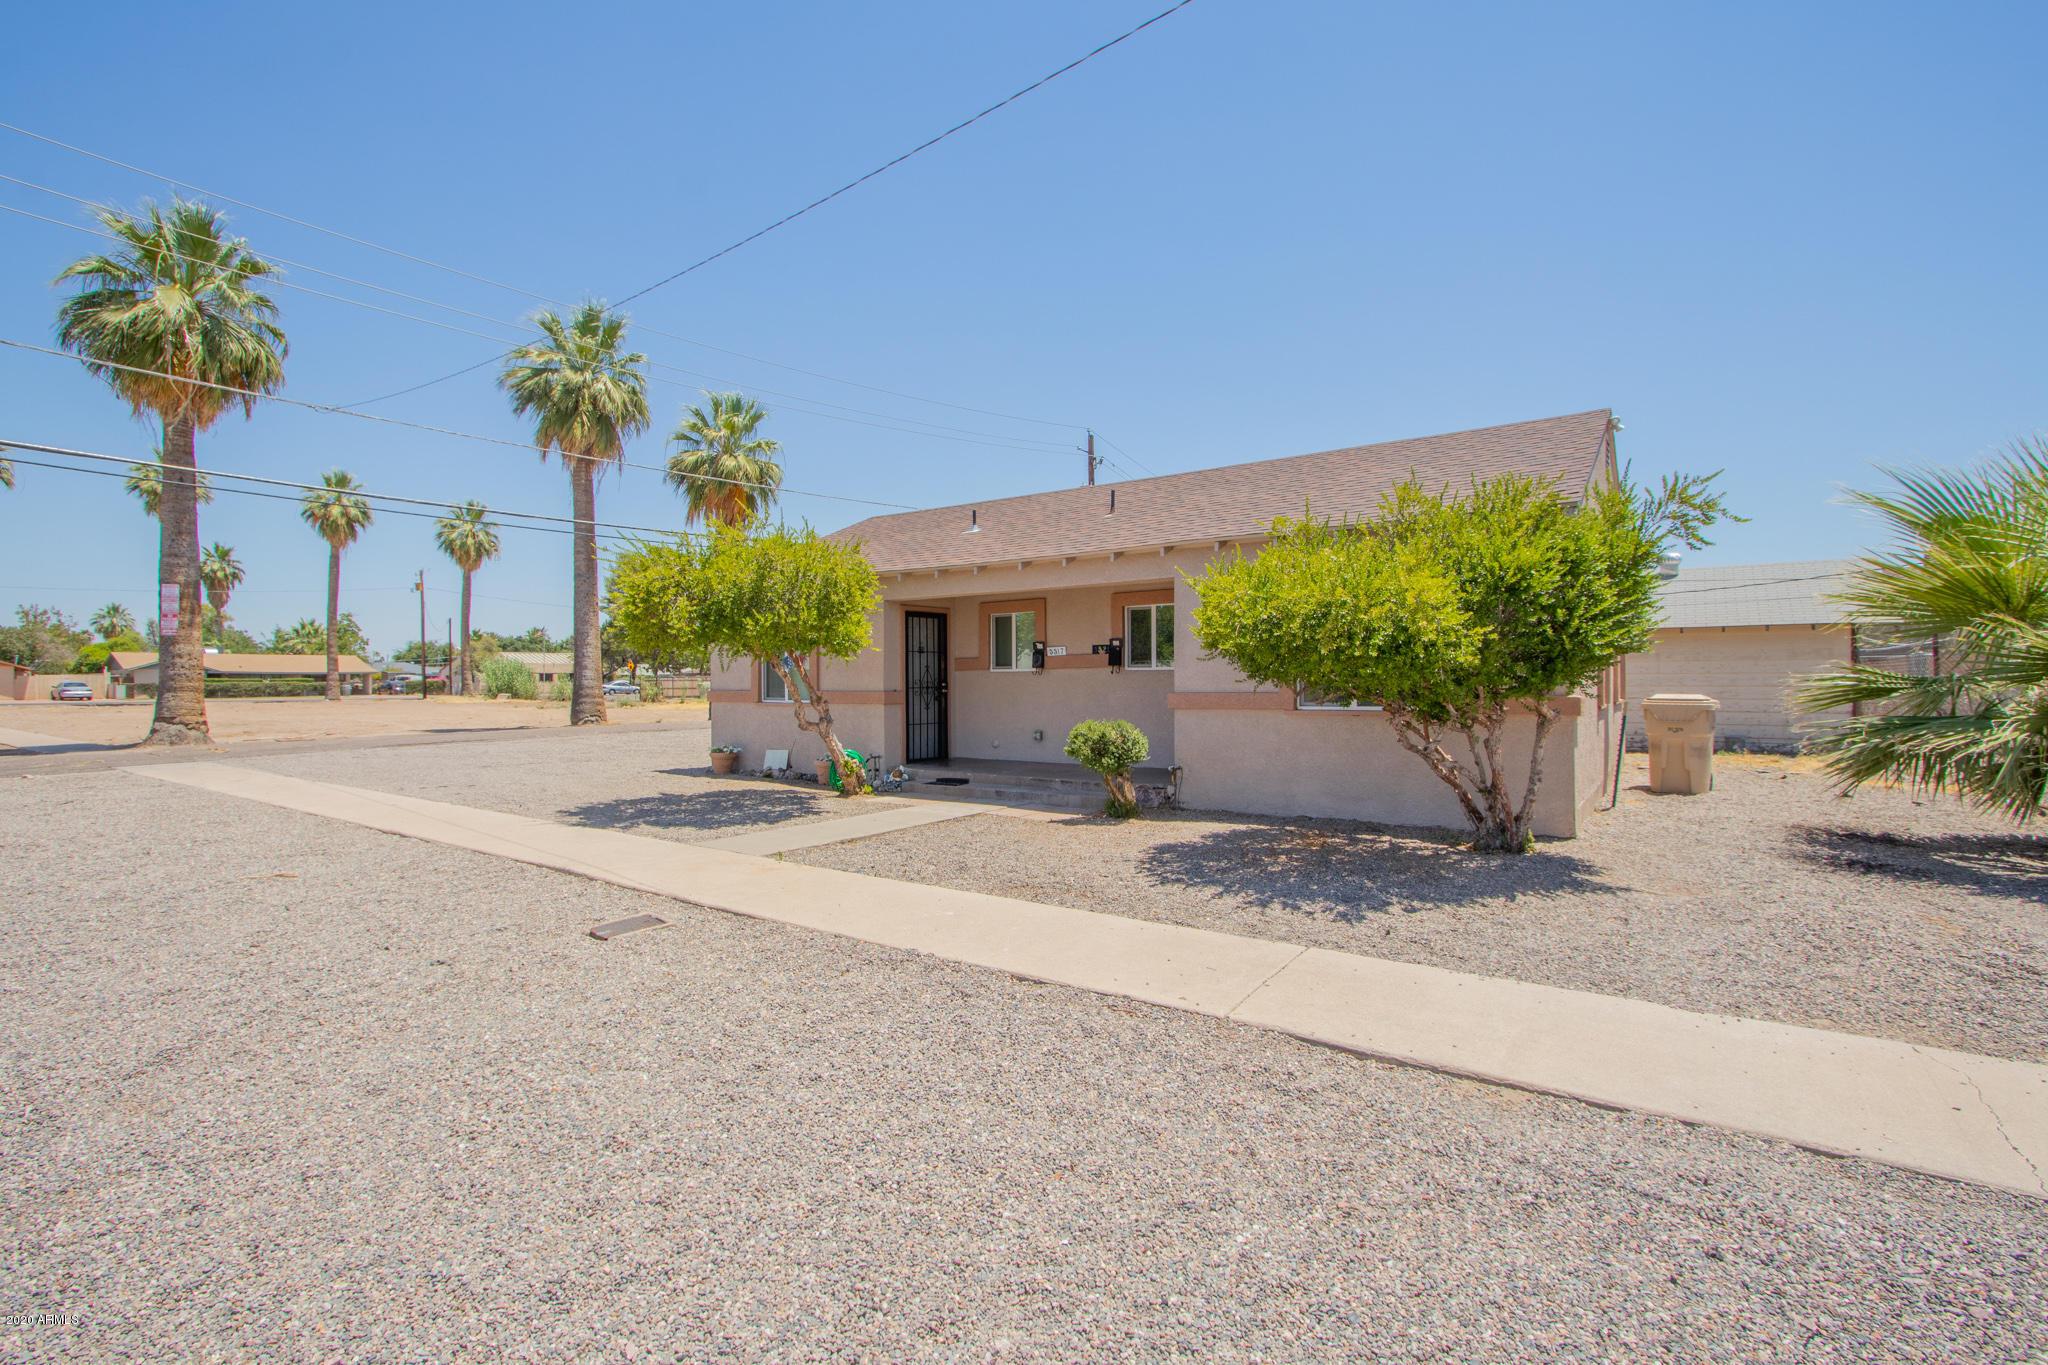 Photo of 5521 W PALMAIRE Avenue, Glendale, AZ 85301